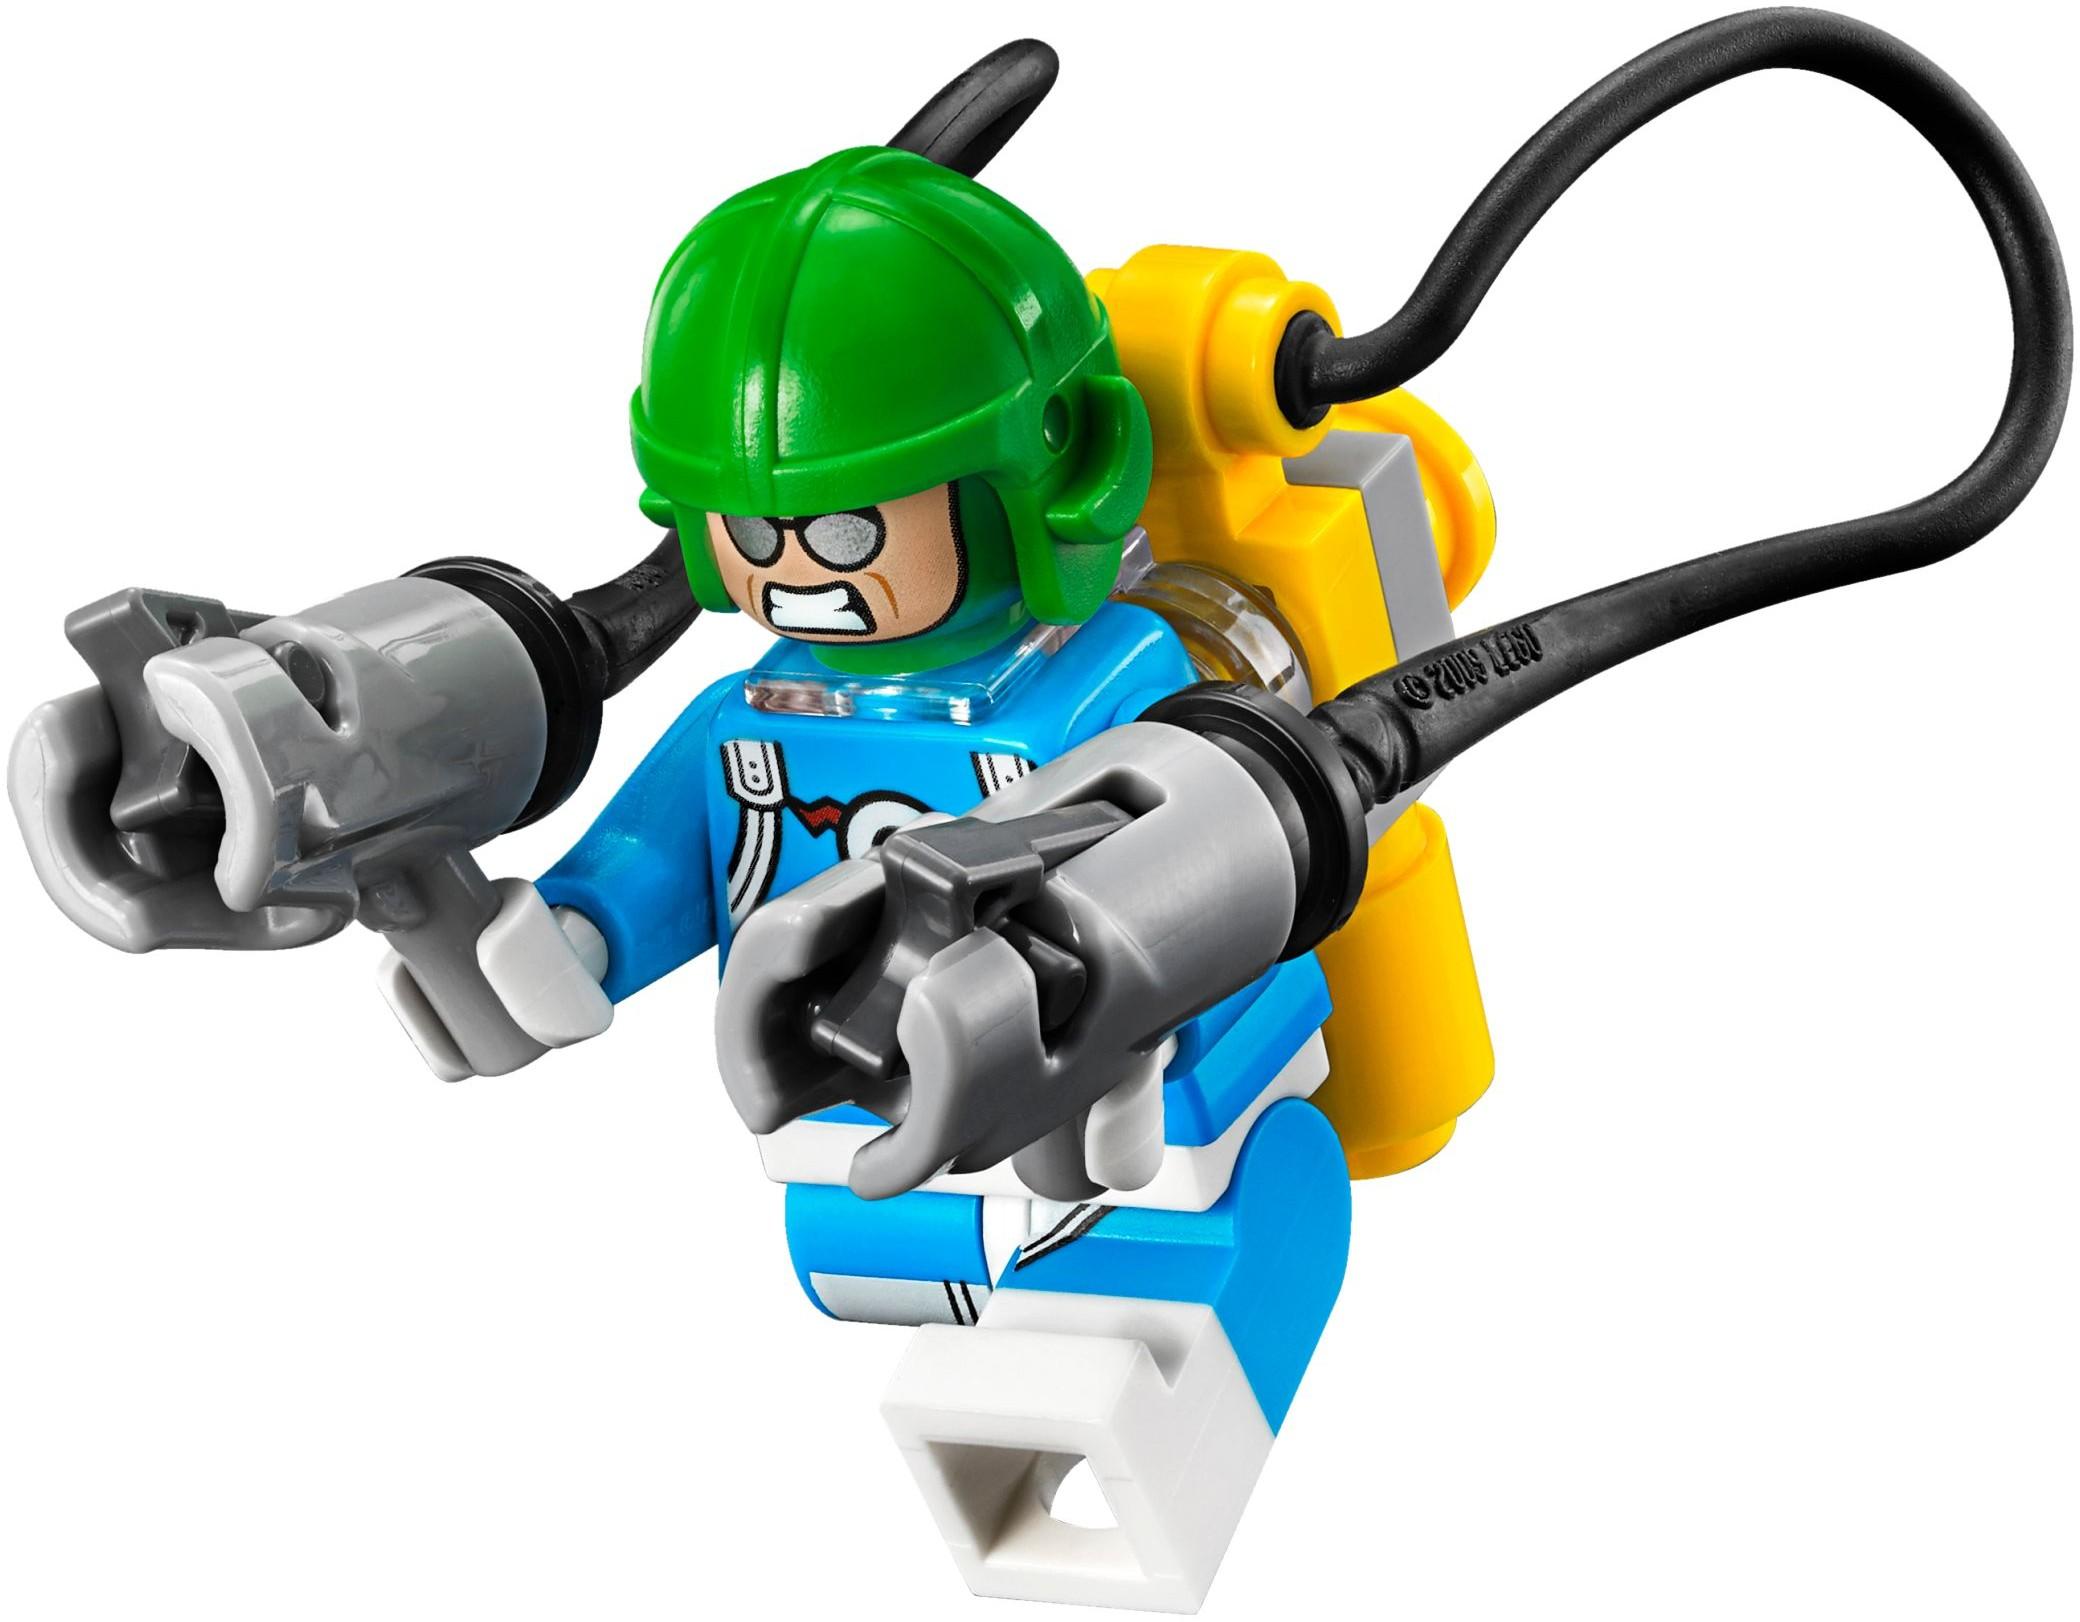 LEGO Batman Movie Condiment King /& Captain Boomerang Mini Figures Egghead